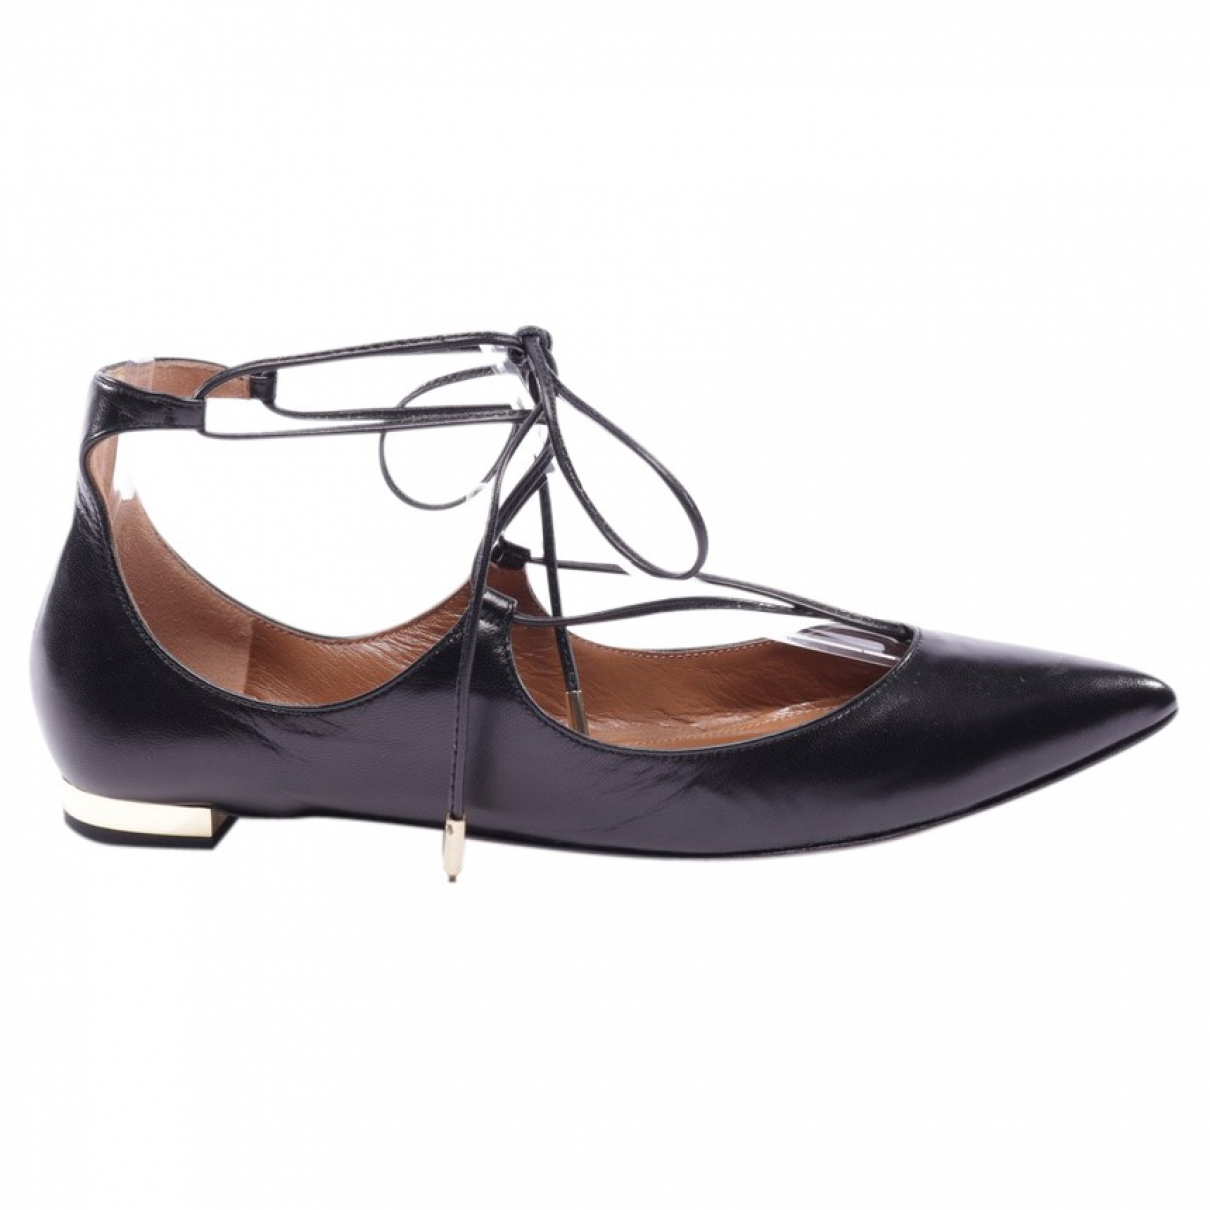 Aquazzura \N Black Leather Sandals for Women 37 EU